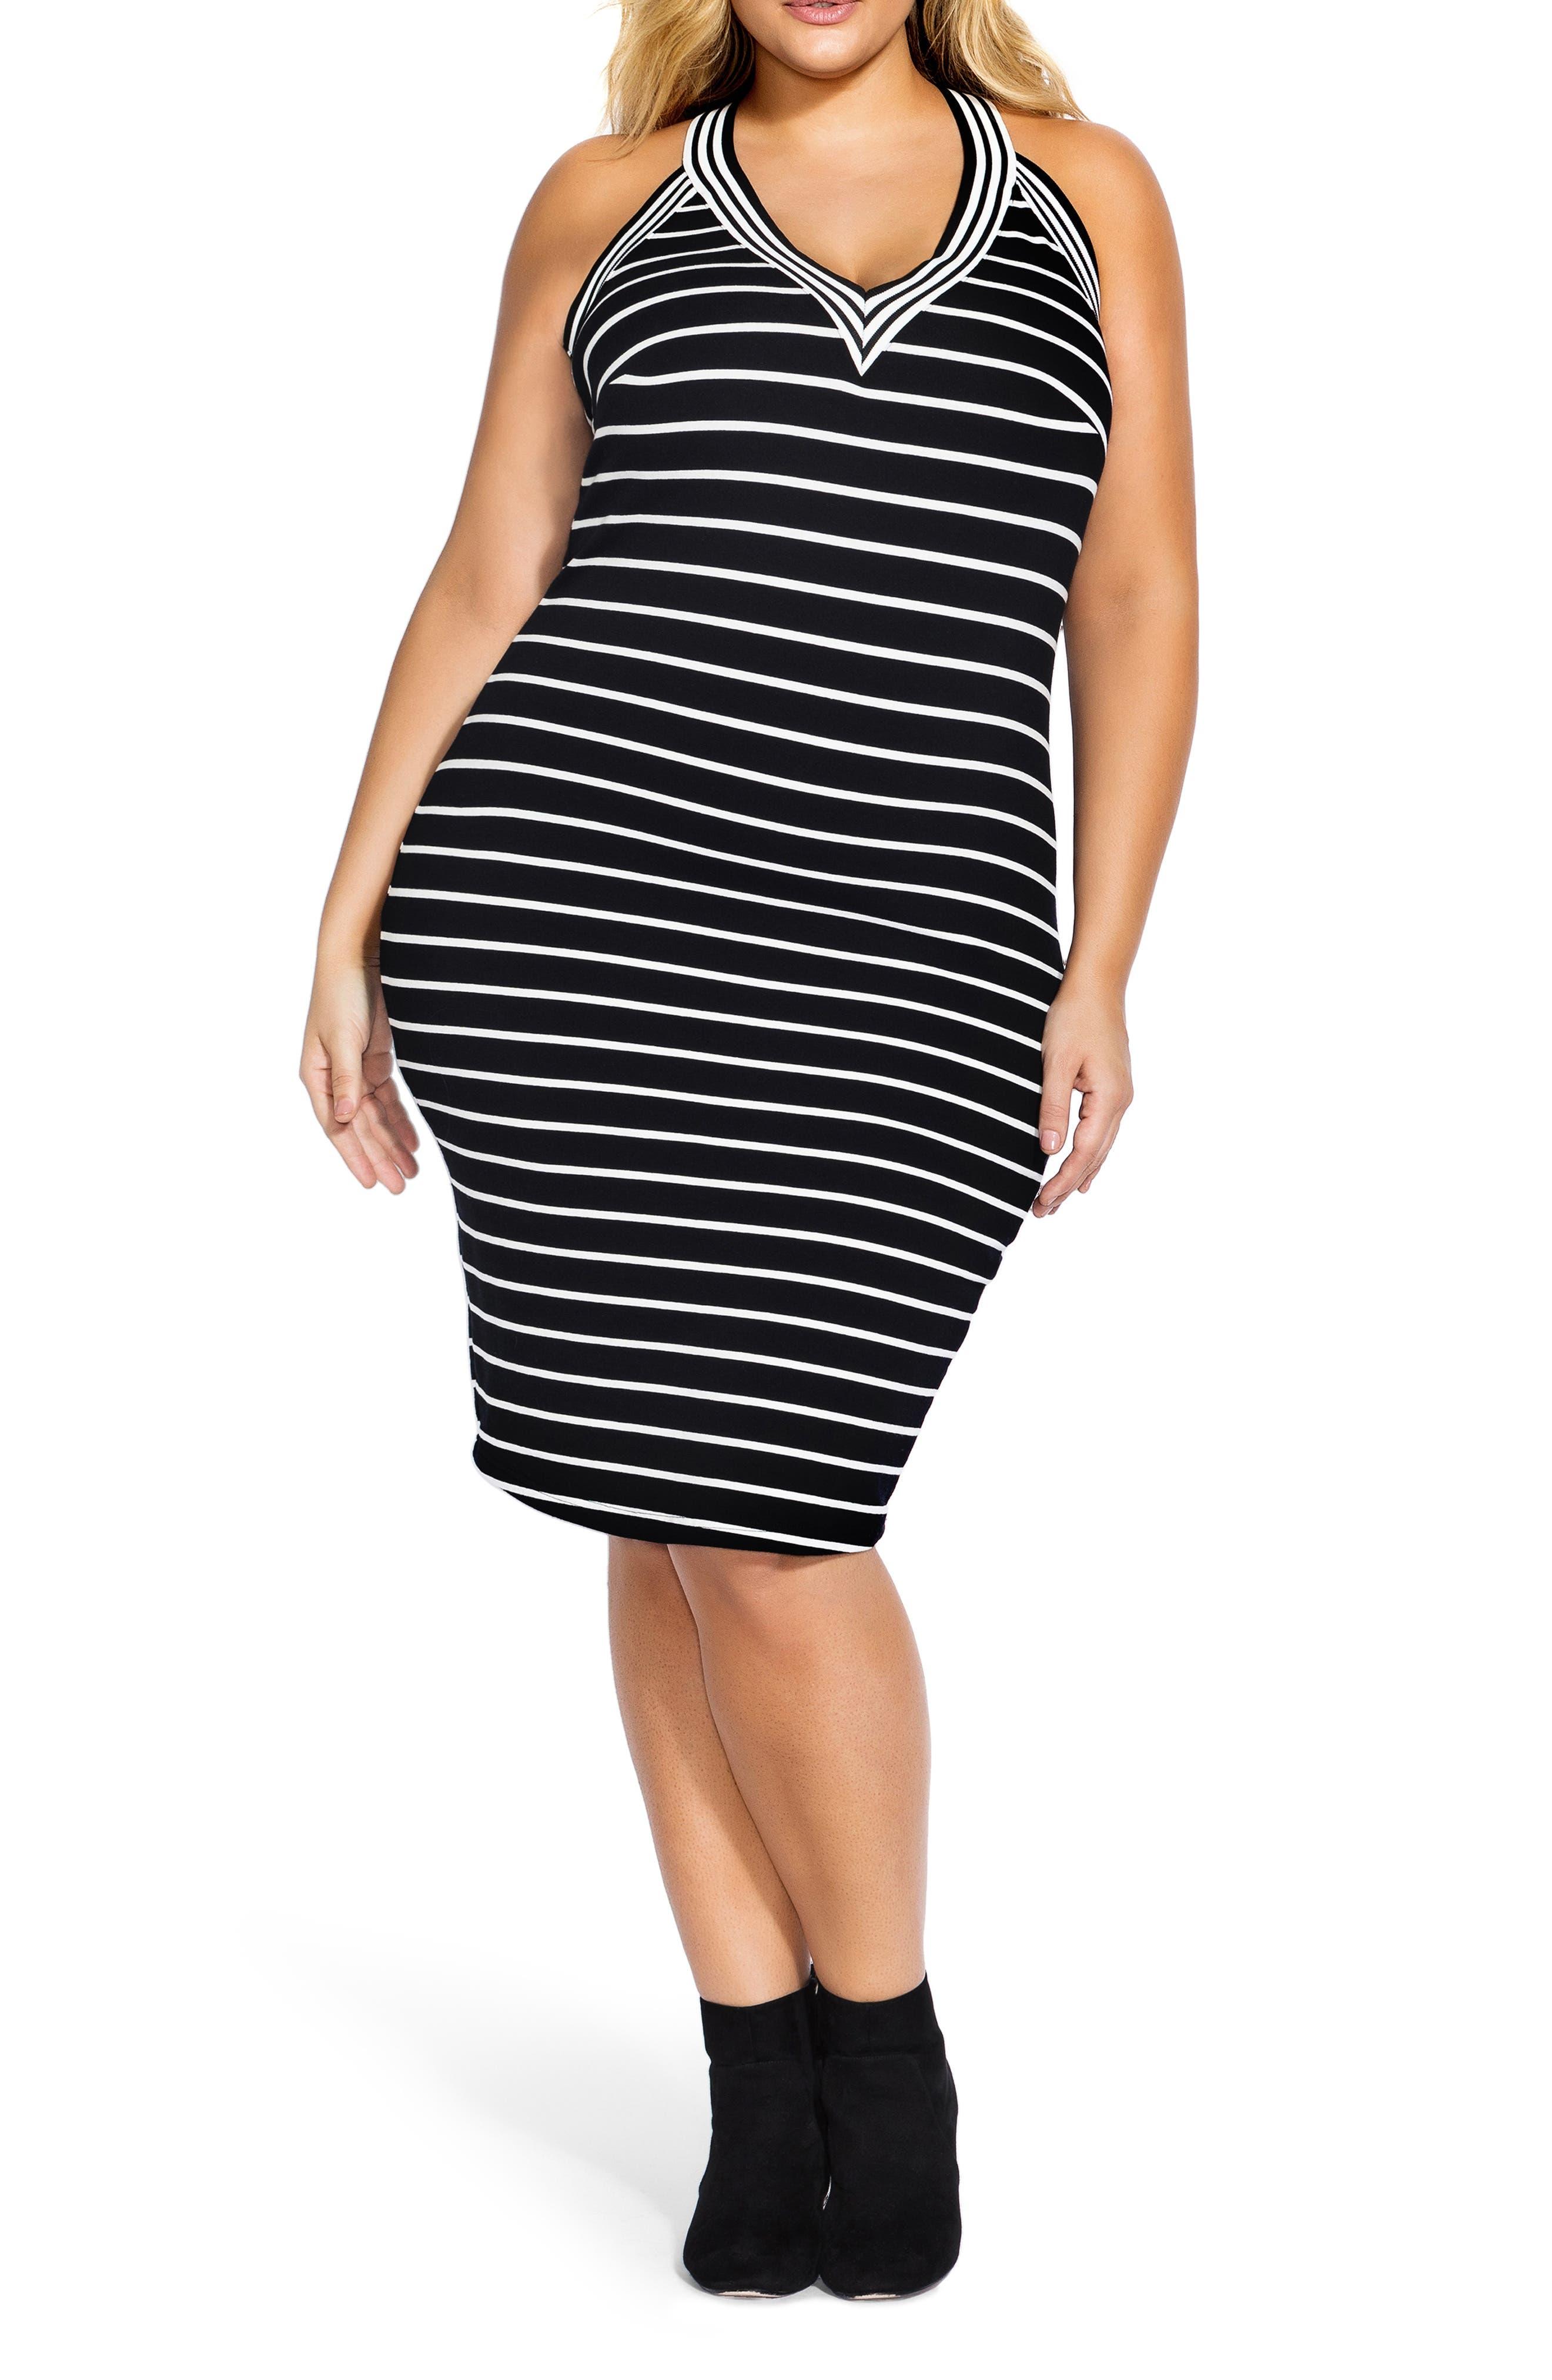 CITY CHIC, Stripe Racerback Dress, Main thumbnail 1, color, WHITE STRIPE